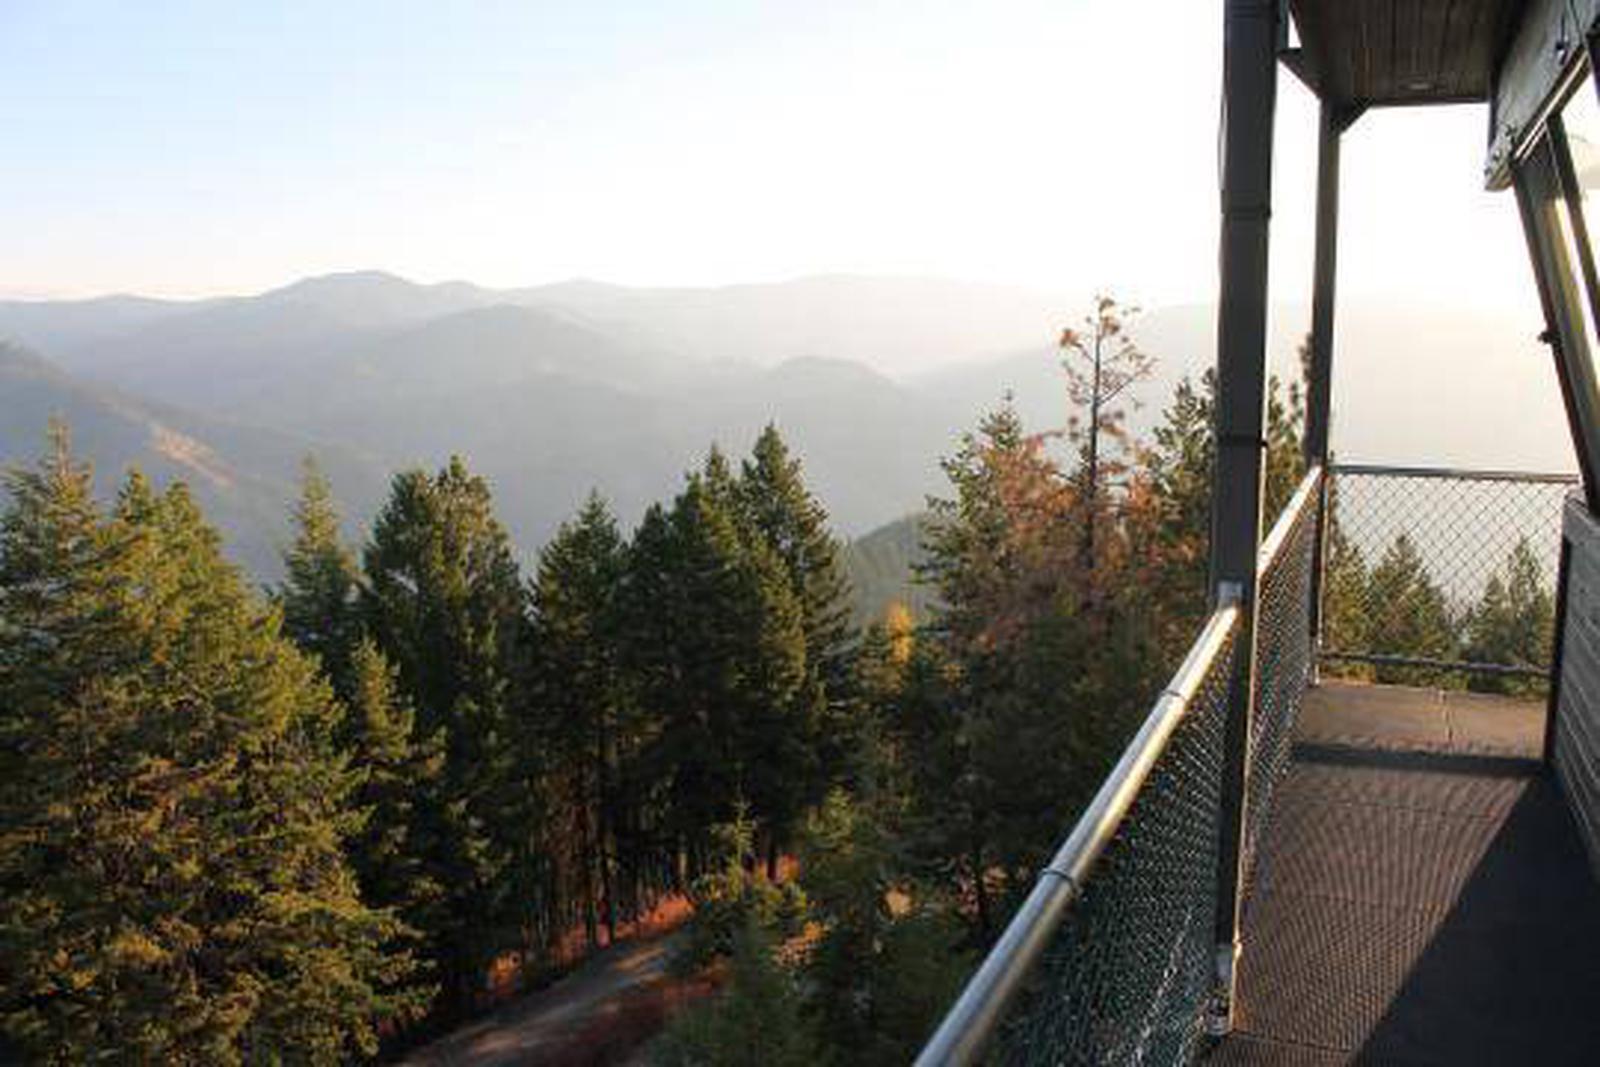 Thompson Peak Lookout view.Thompson Peak Lookout